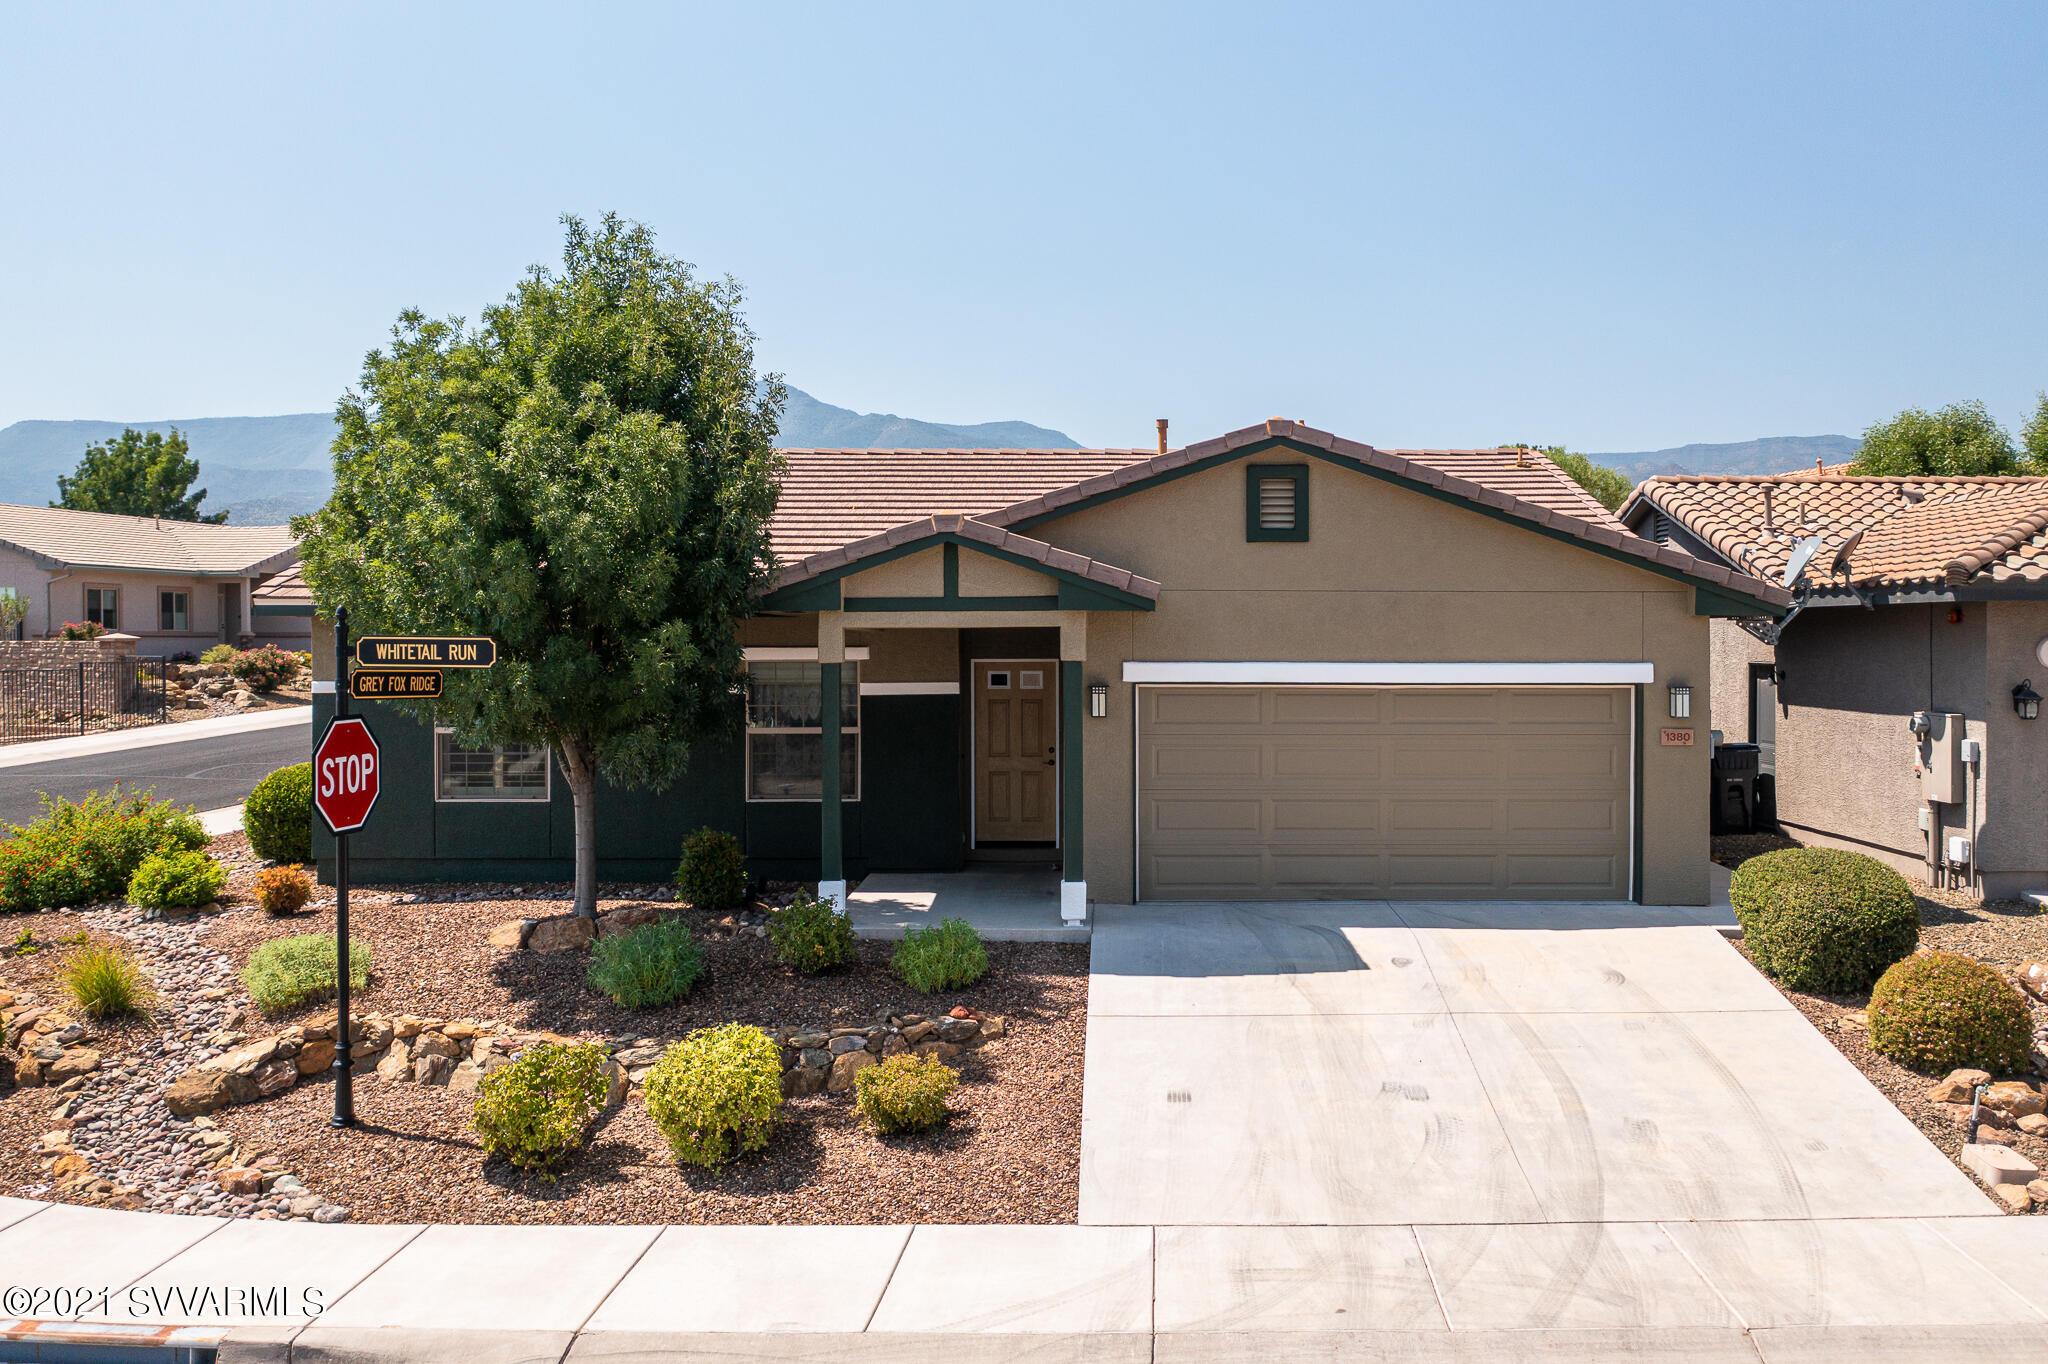 1380 Whitetail Cottonwood, AZ 86326